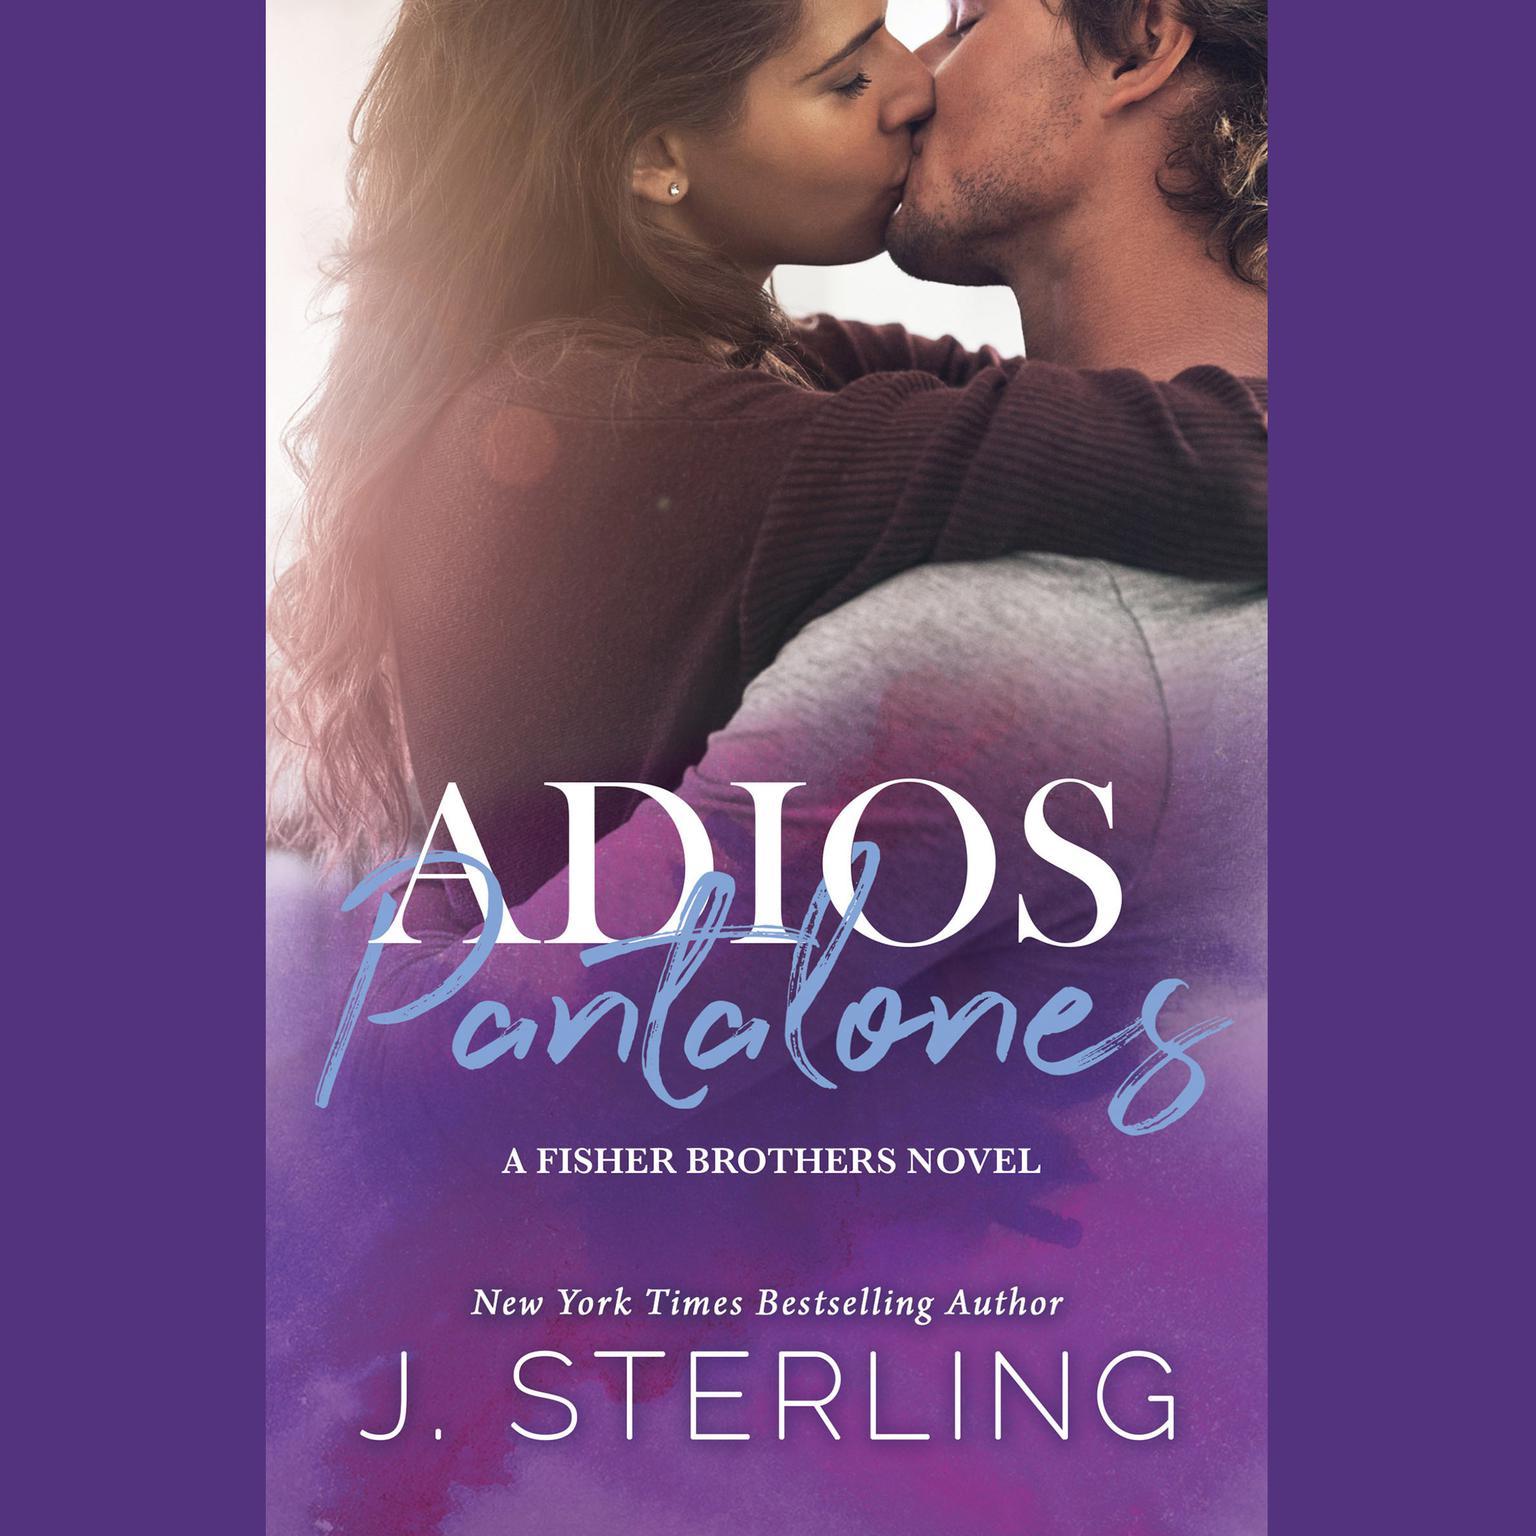 Adios Pantalones: A Single Mom Romance Audiobook, by J. Sterling